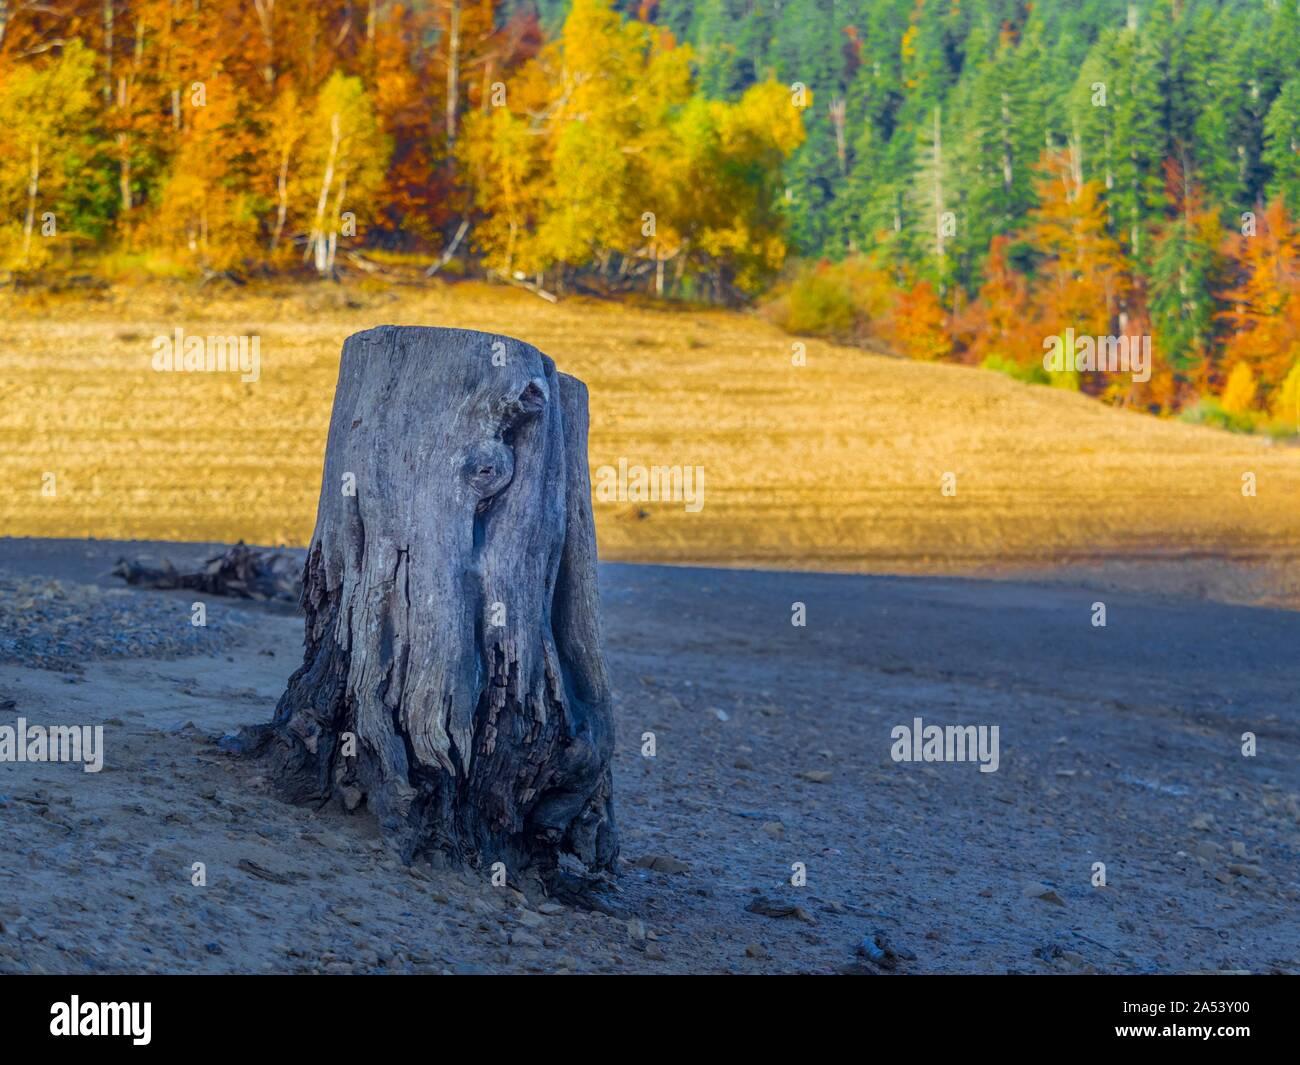 Morning sunlight forest country-side countryside Lokve lake Lokvarsko jezero Croatia lonely dried tree stump in foreground Stock Photo